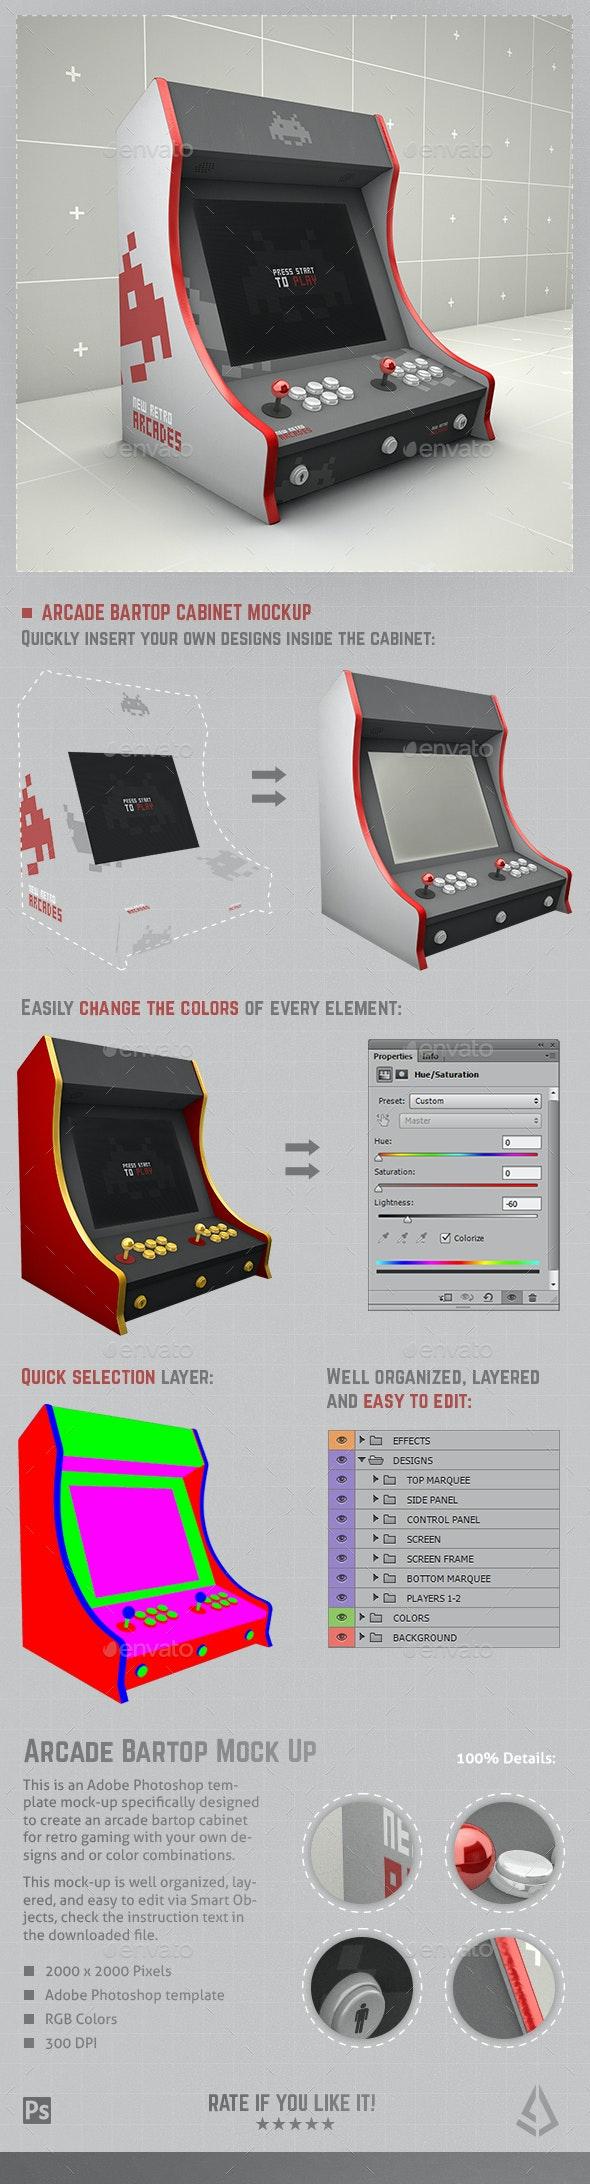 Retro Gaming Bartop Arcade Cabinet Mockup Template - Displays Product Mock-Ups